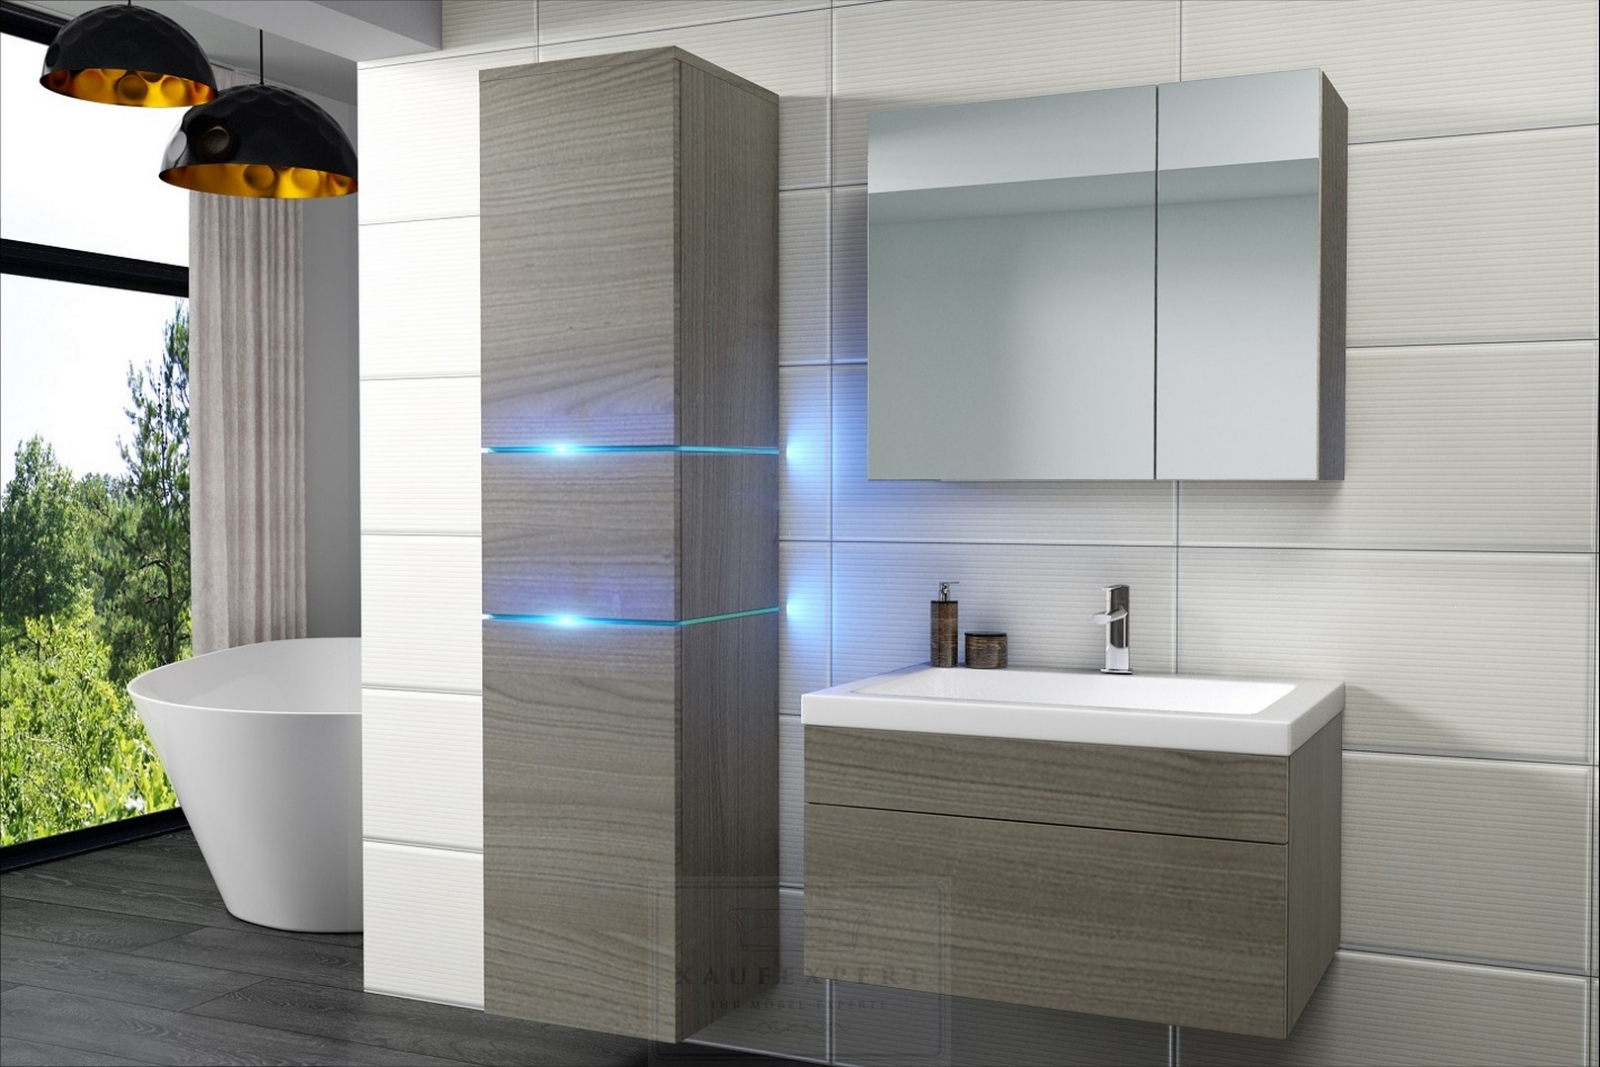 kaufexpert badm bel set ledox 170 cm cardiff cherry keramik waschbecken badezimmer led. Black Bedroom Furniture Sets. Home Design Ideas